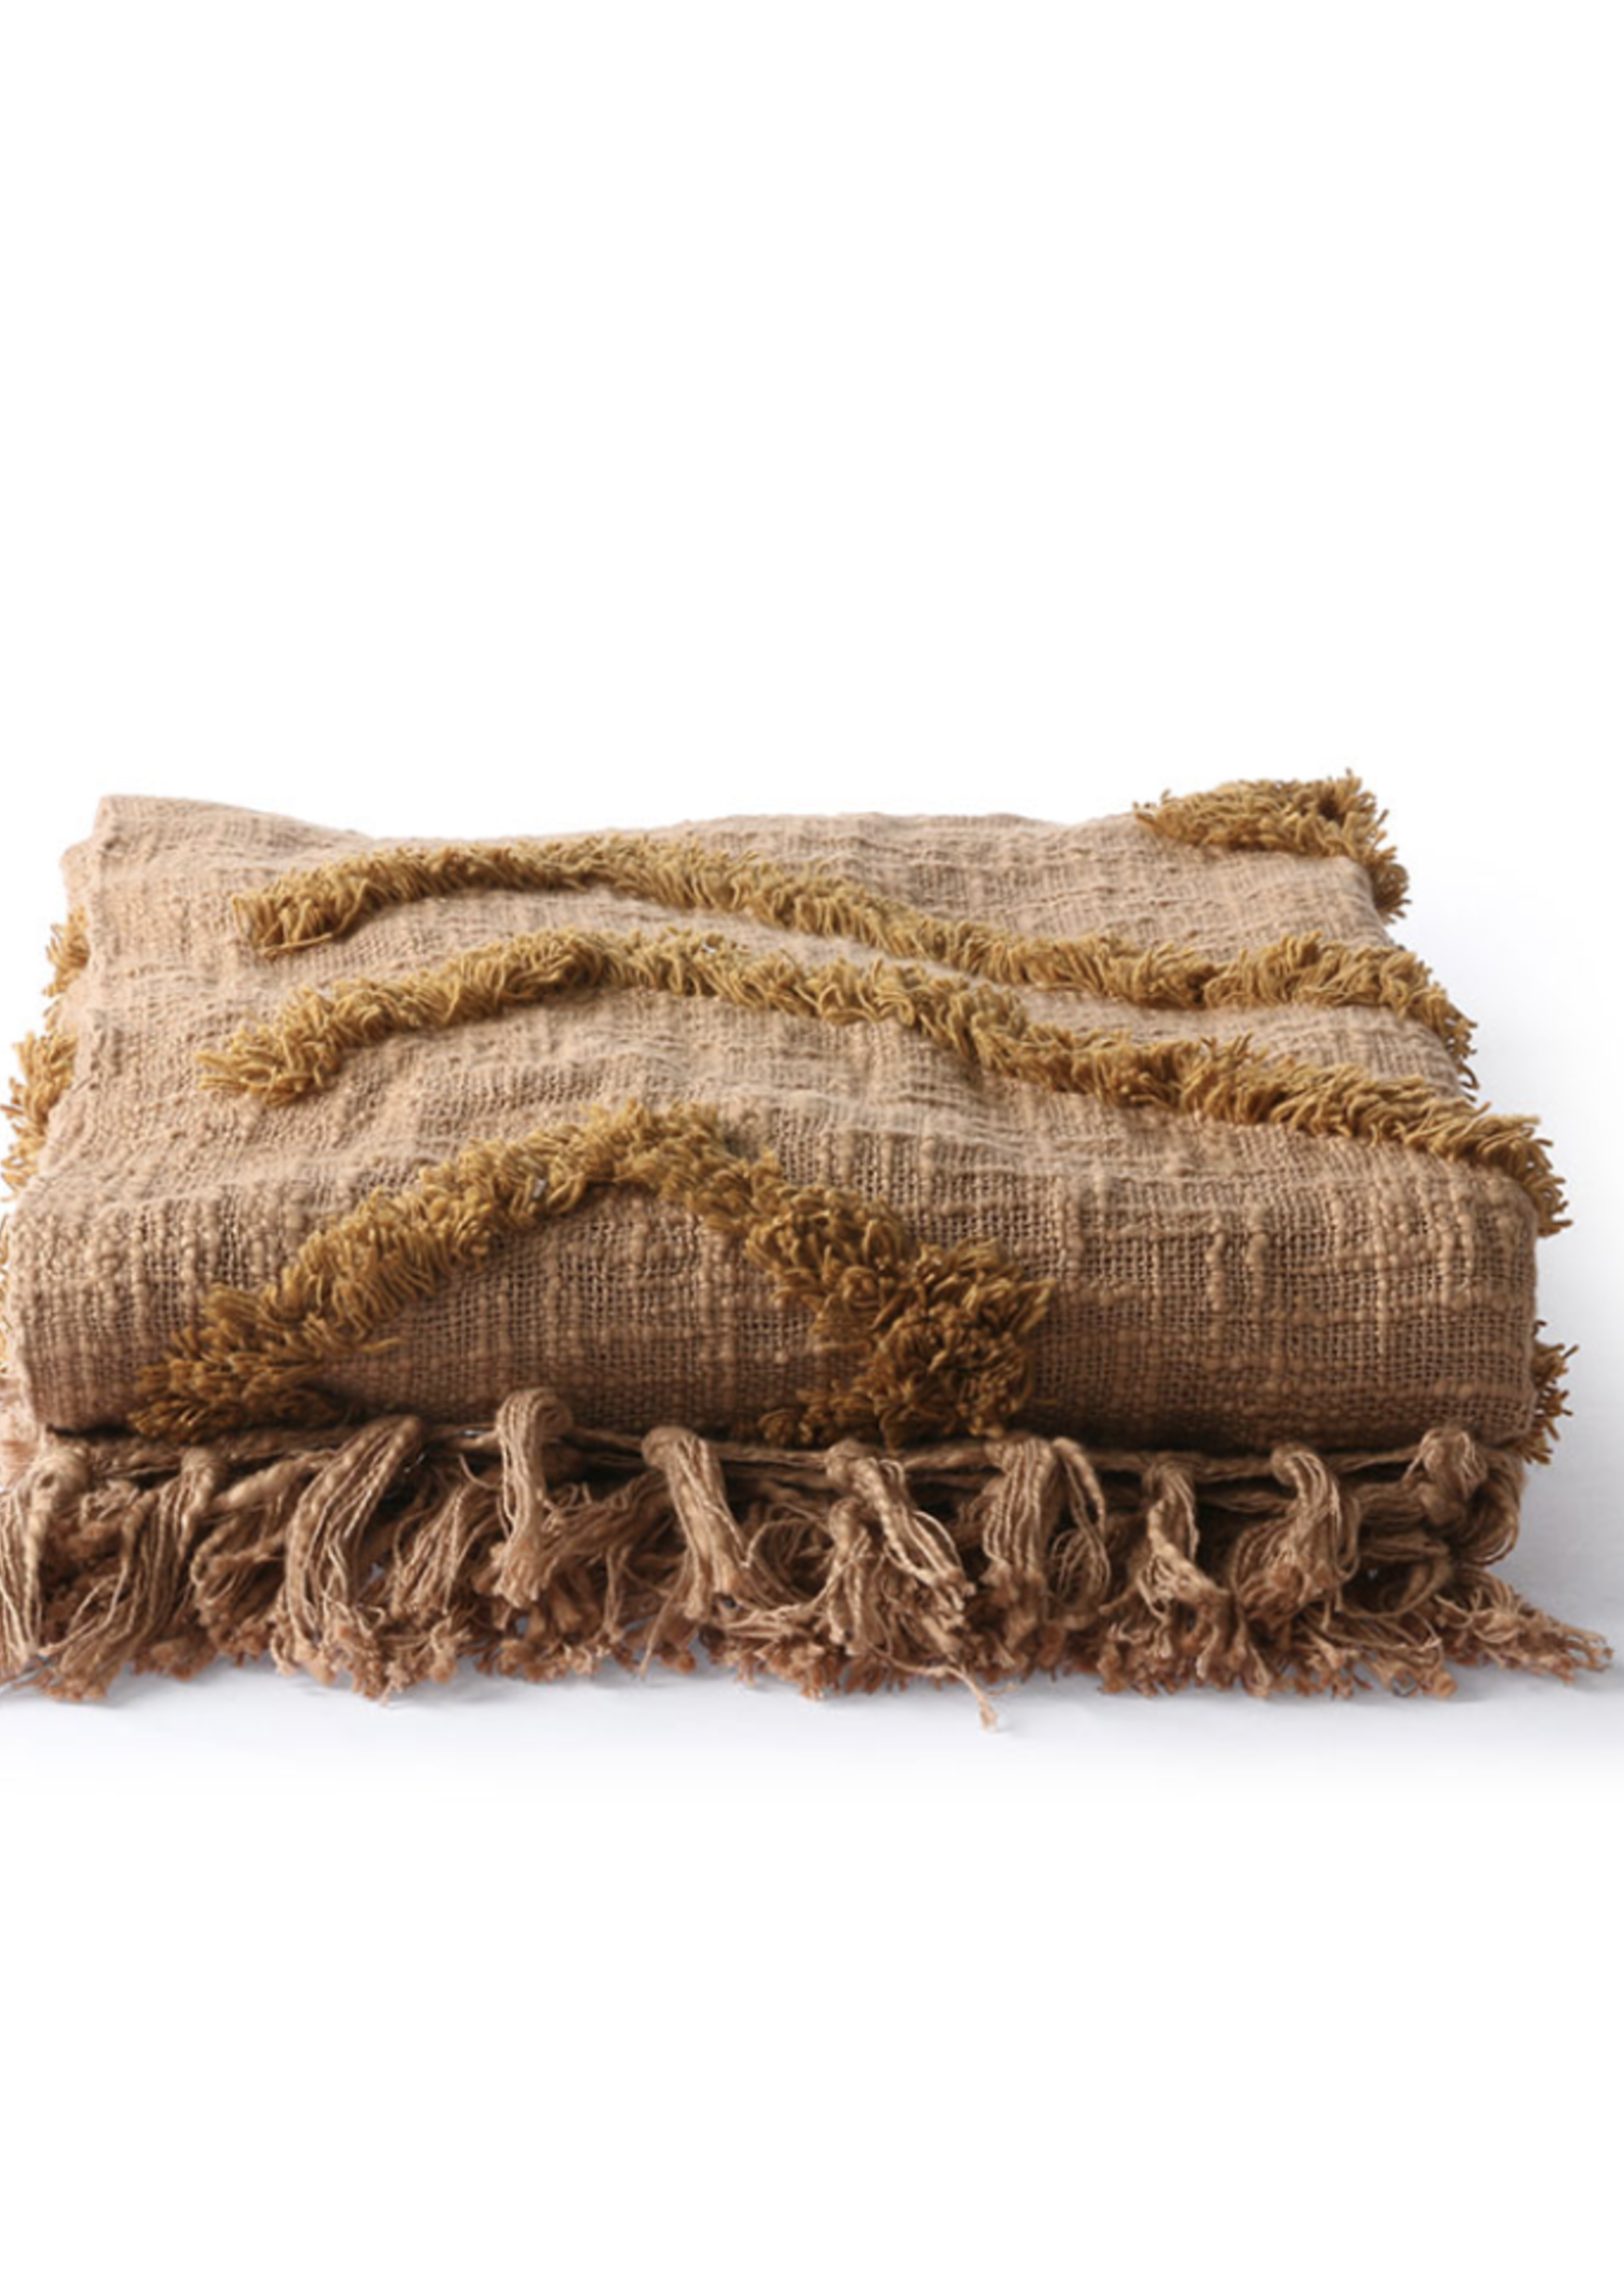 HKliving Hk living cotton fringe pattern throw brown (130x170)